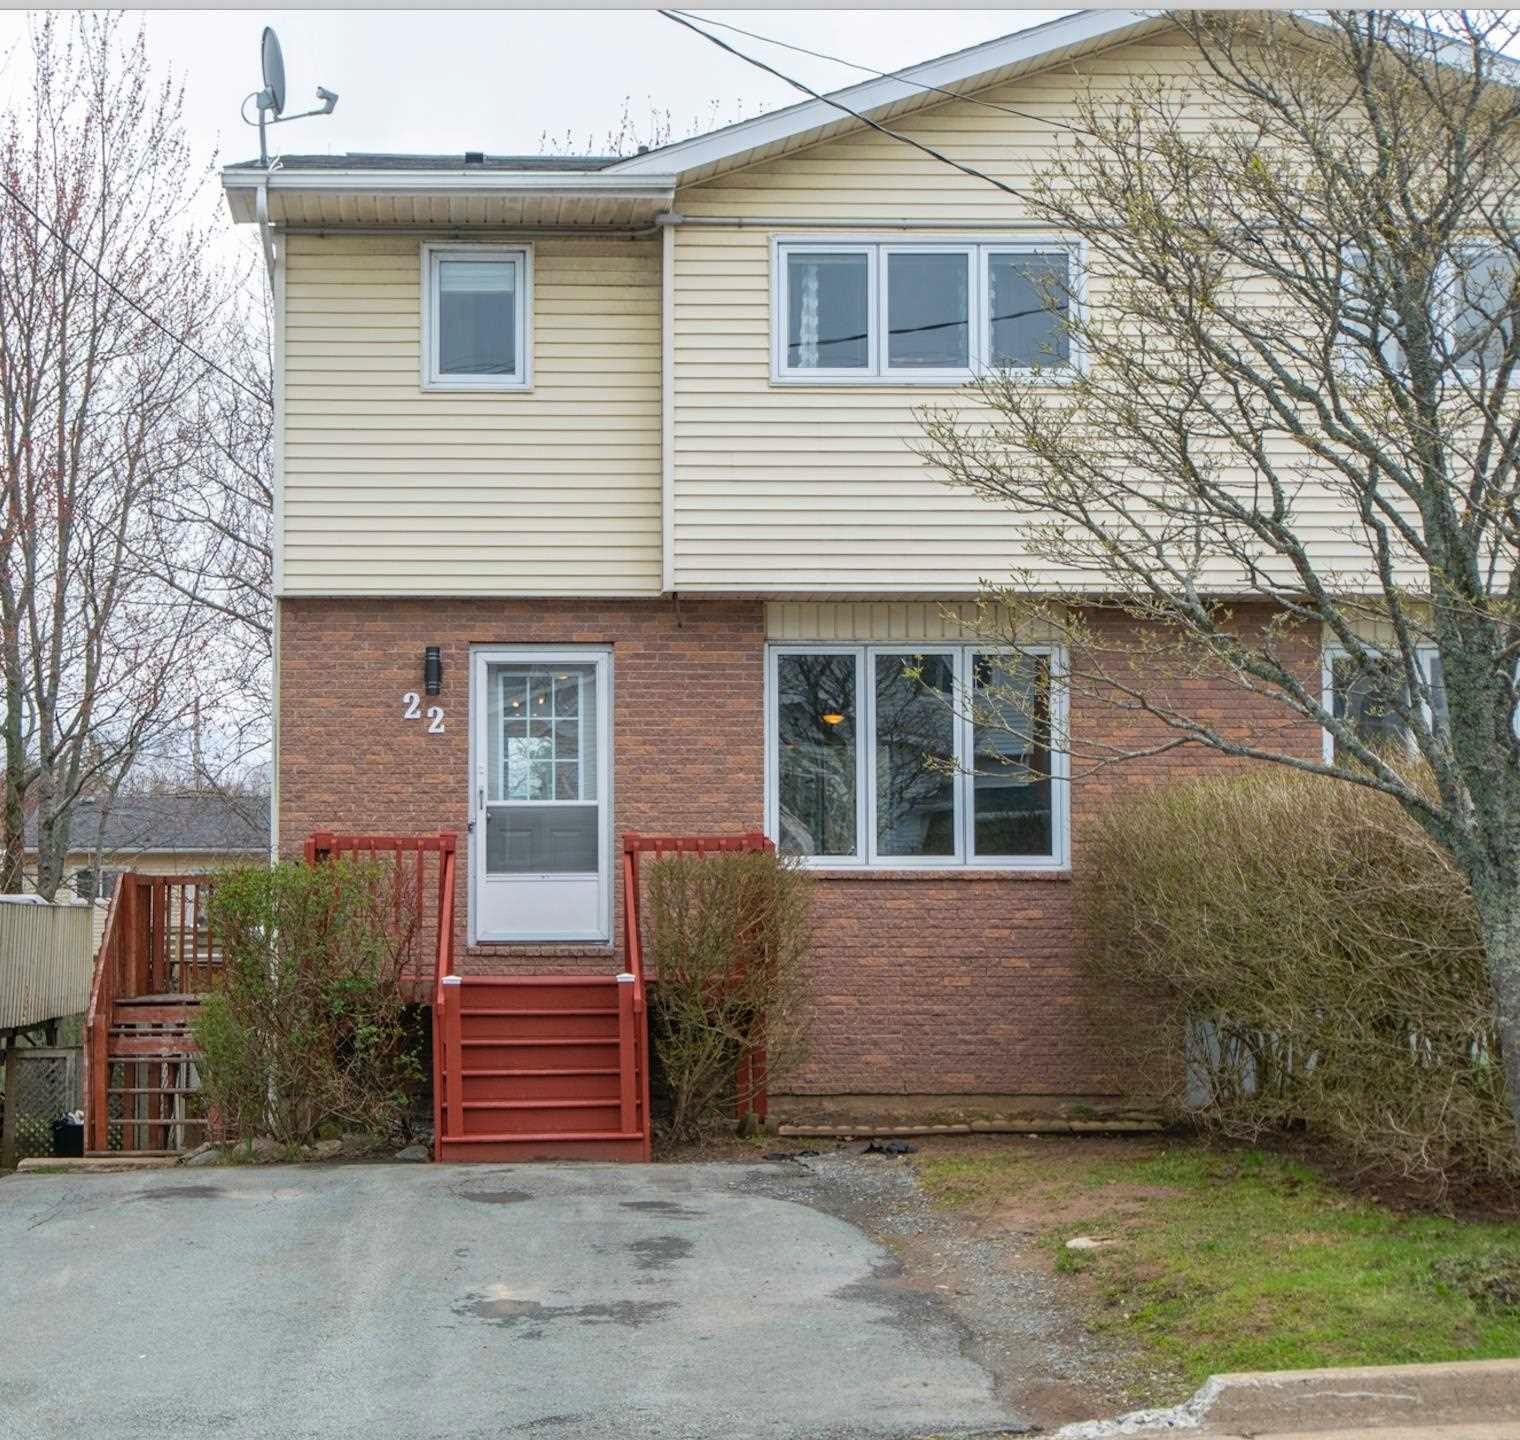 Main Photo: 22 Oakwood Court in Dartmouth: 17-Woodlawn, Portland Estates, Nantucket Residential for sale (Halifax-Dartmouth)  : MLS®# 202110318